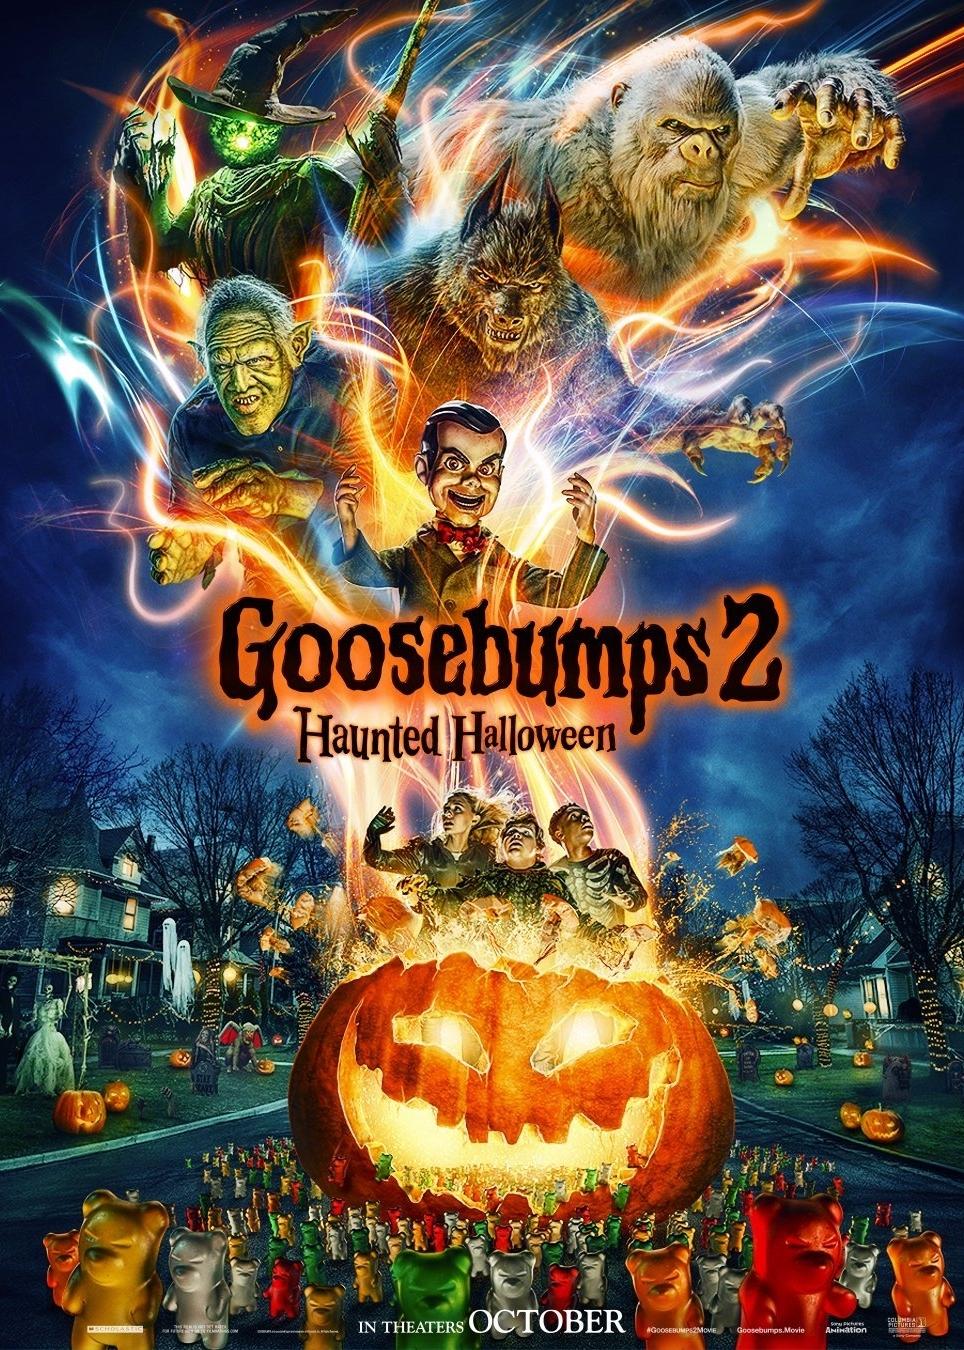 Goosebumps_2_-_Haunted_Halloween.jpg